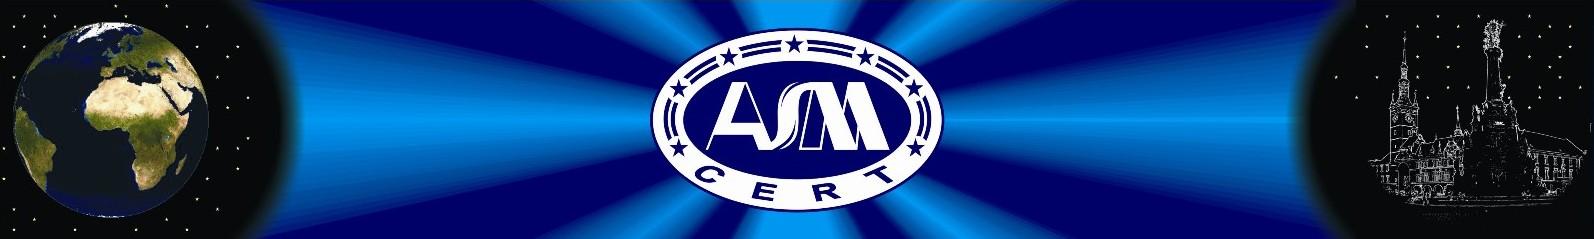 logo firmy ASMcert, s.r.o.